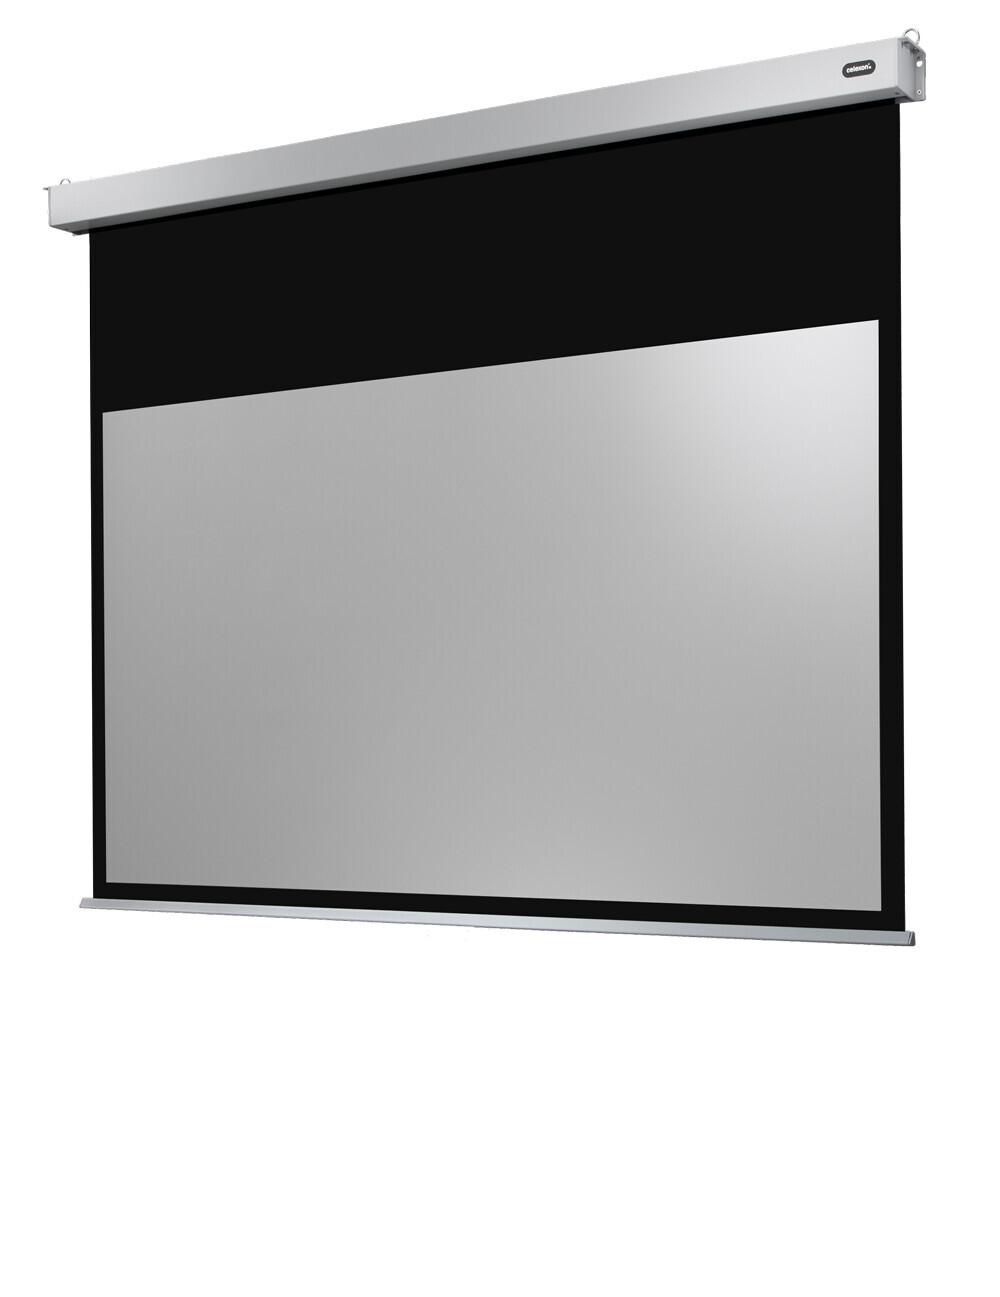 Celexon Electric Professional Plus Screen 300 x 169 cm